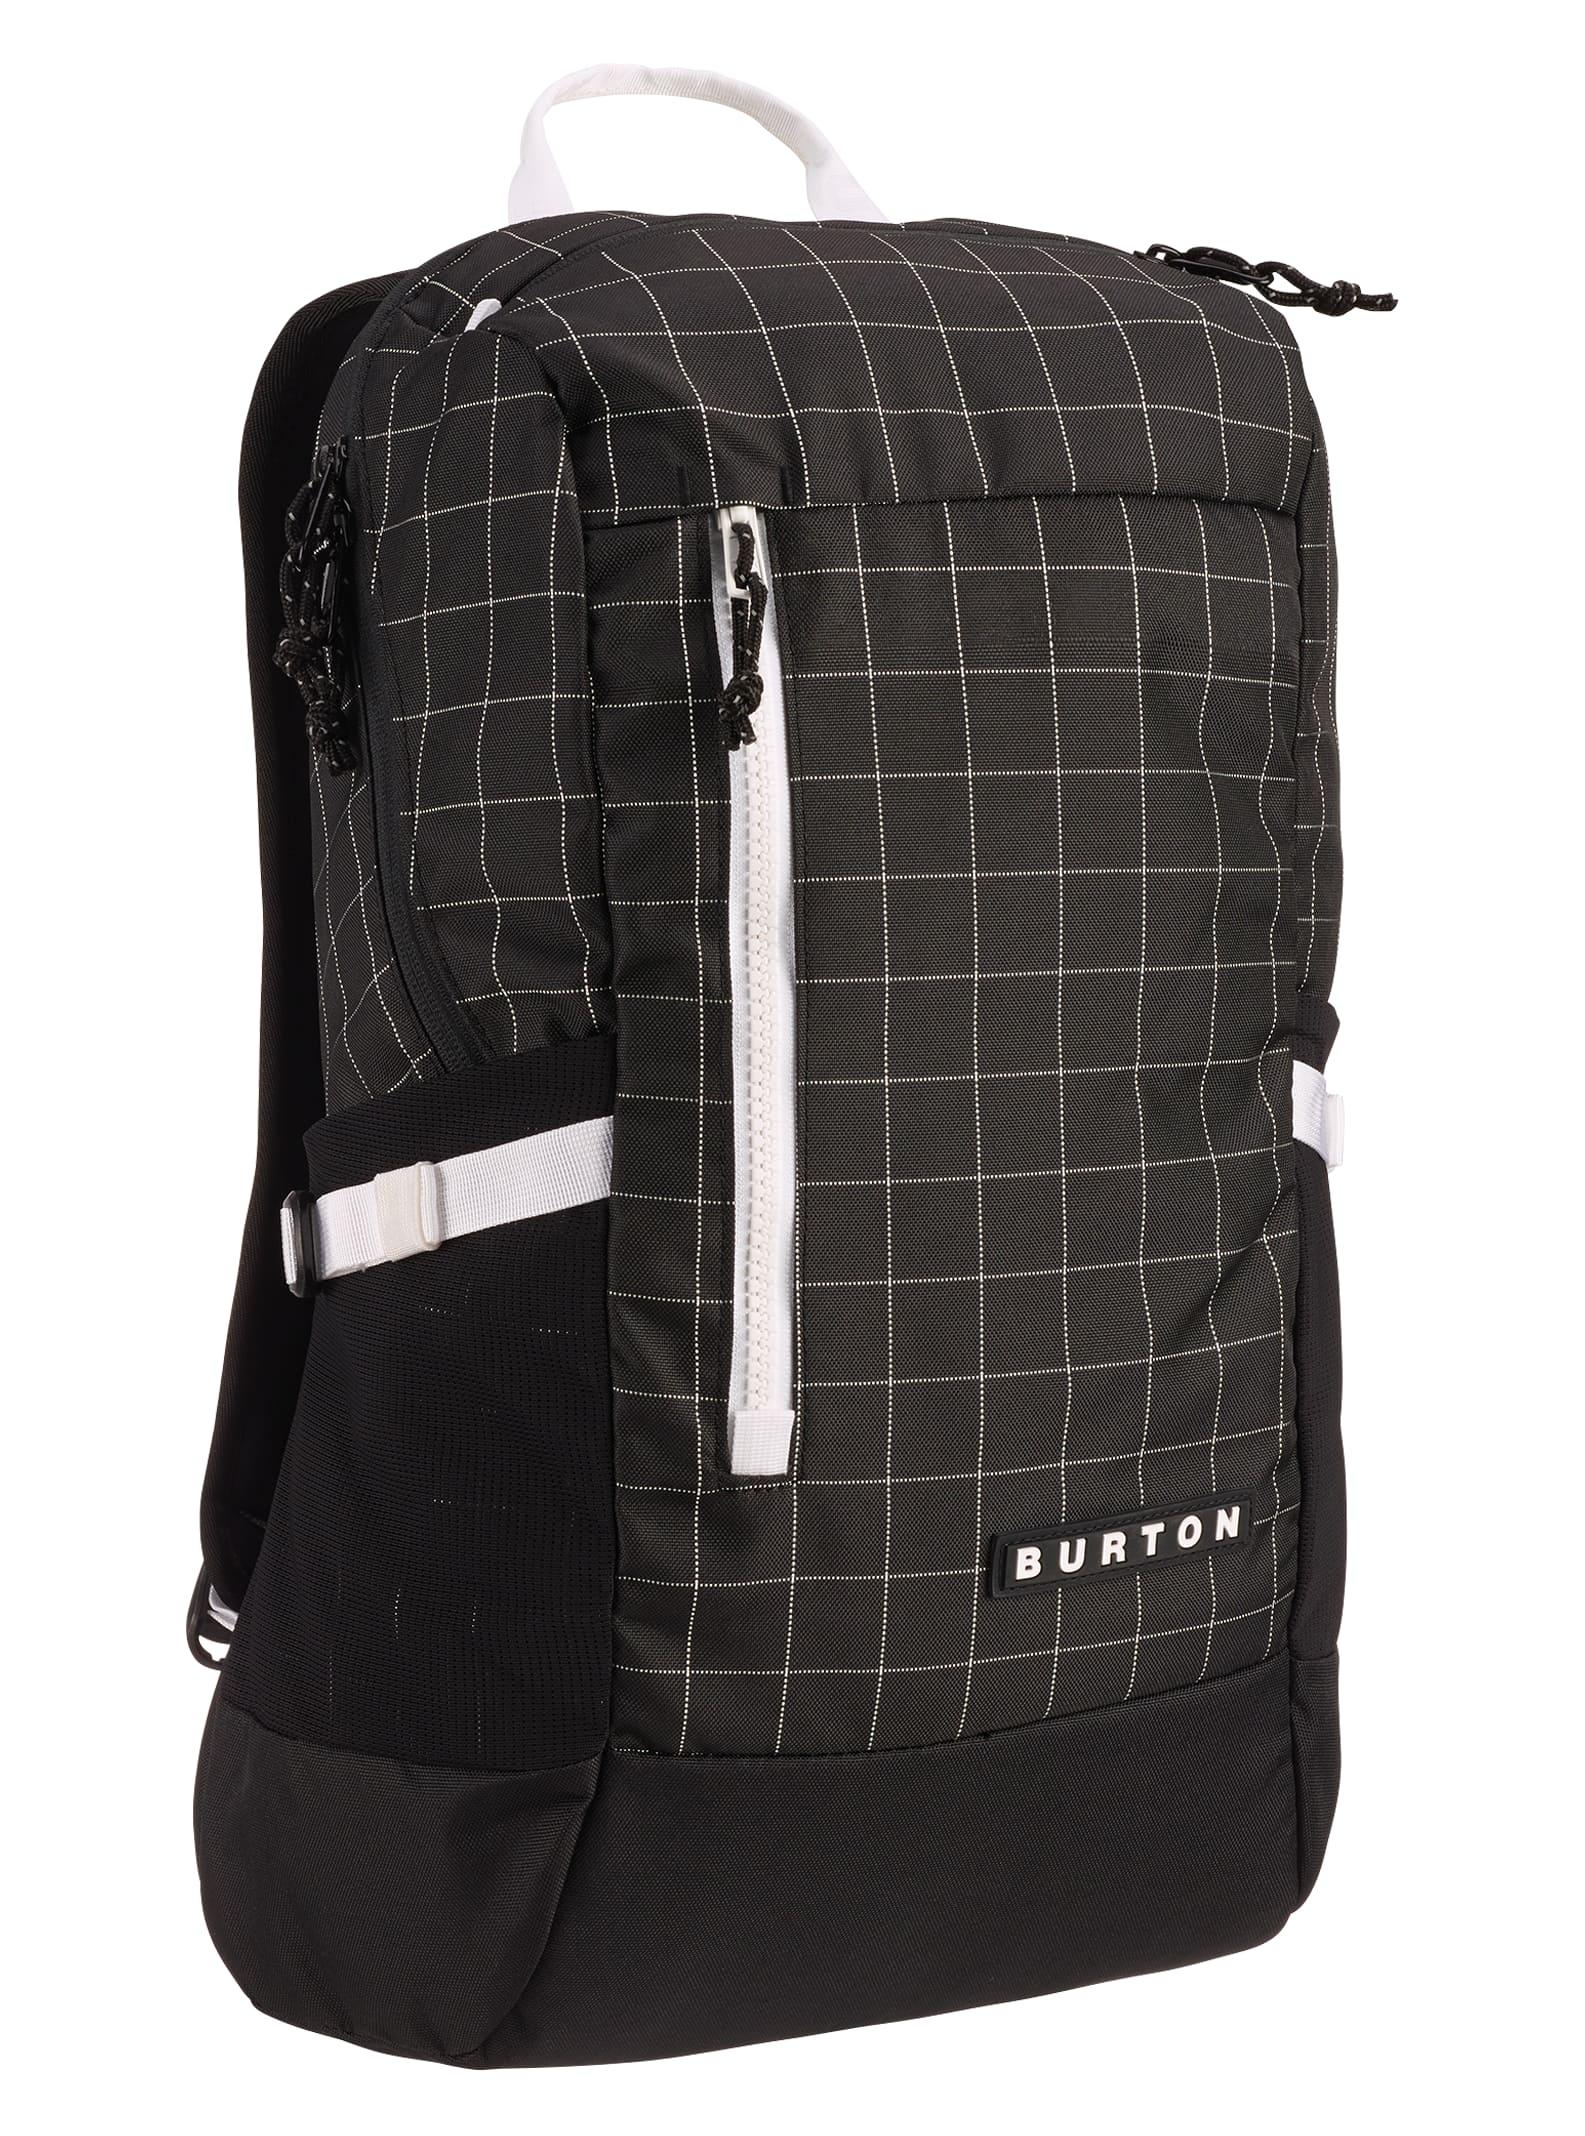 bd57fbaec59e Backpacks | Burton Snowboards